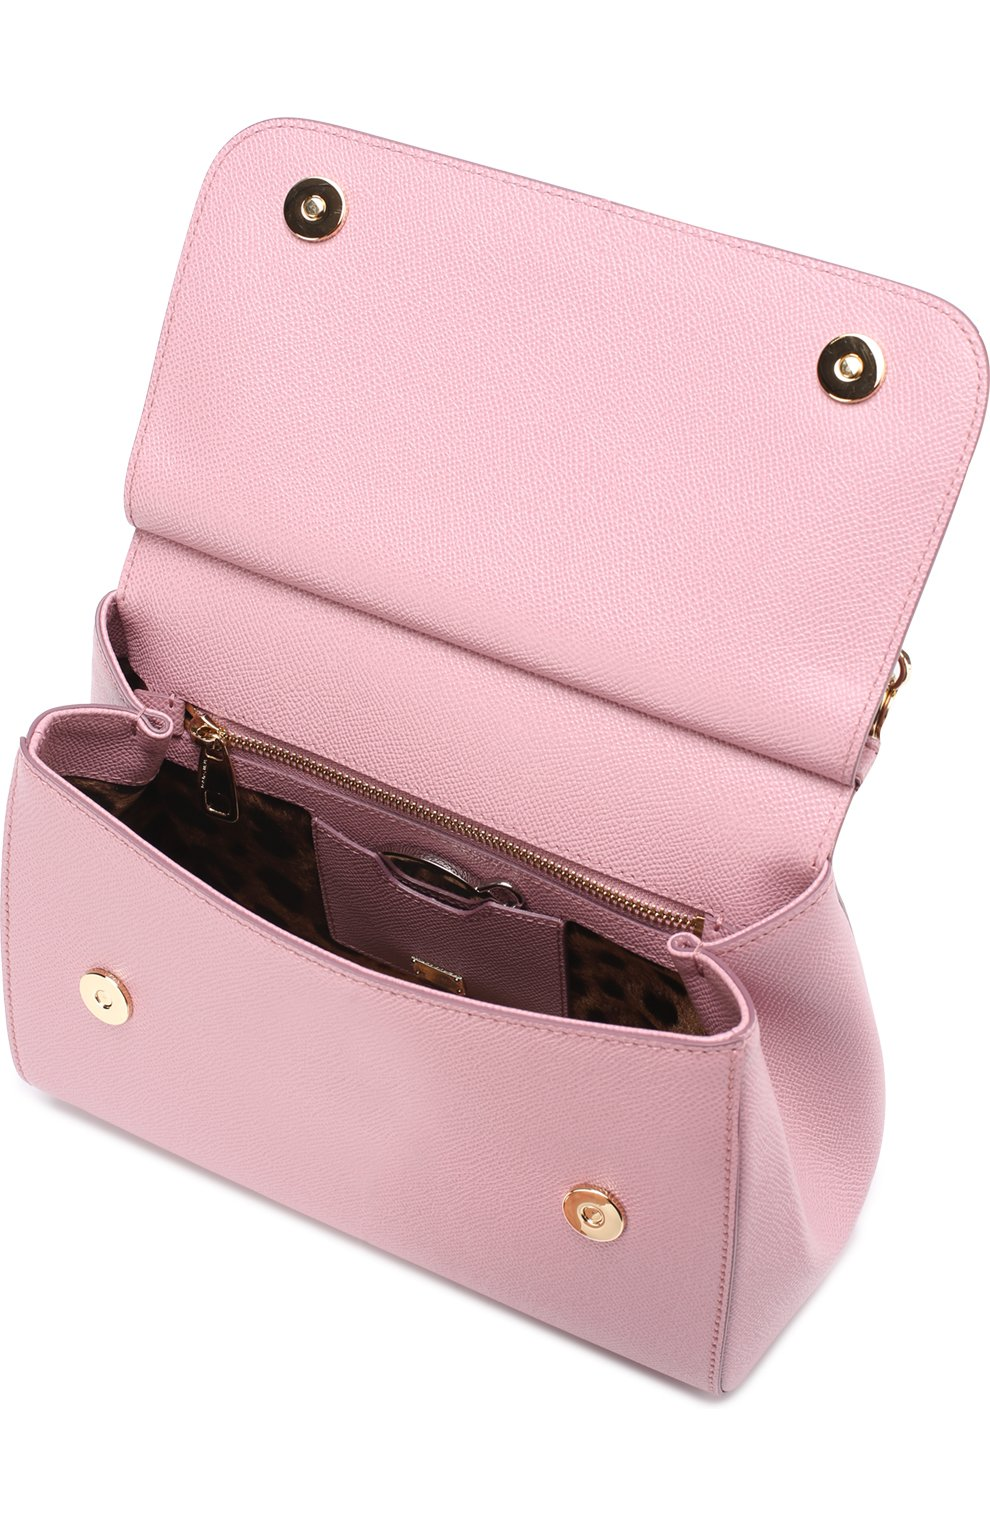 Сумка Sicily medium Dolce & Gabbana розовая цвета | Фото №4